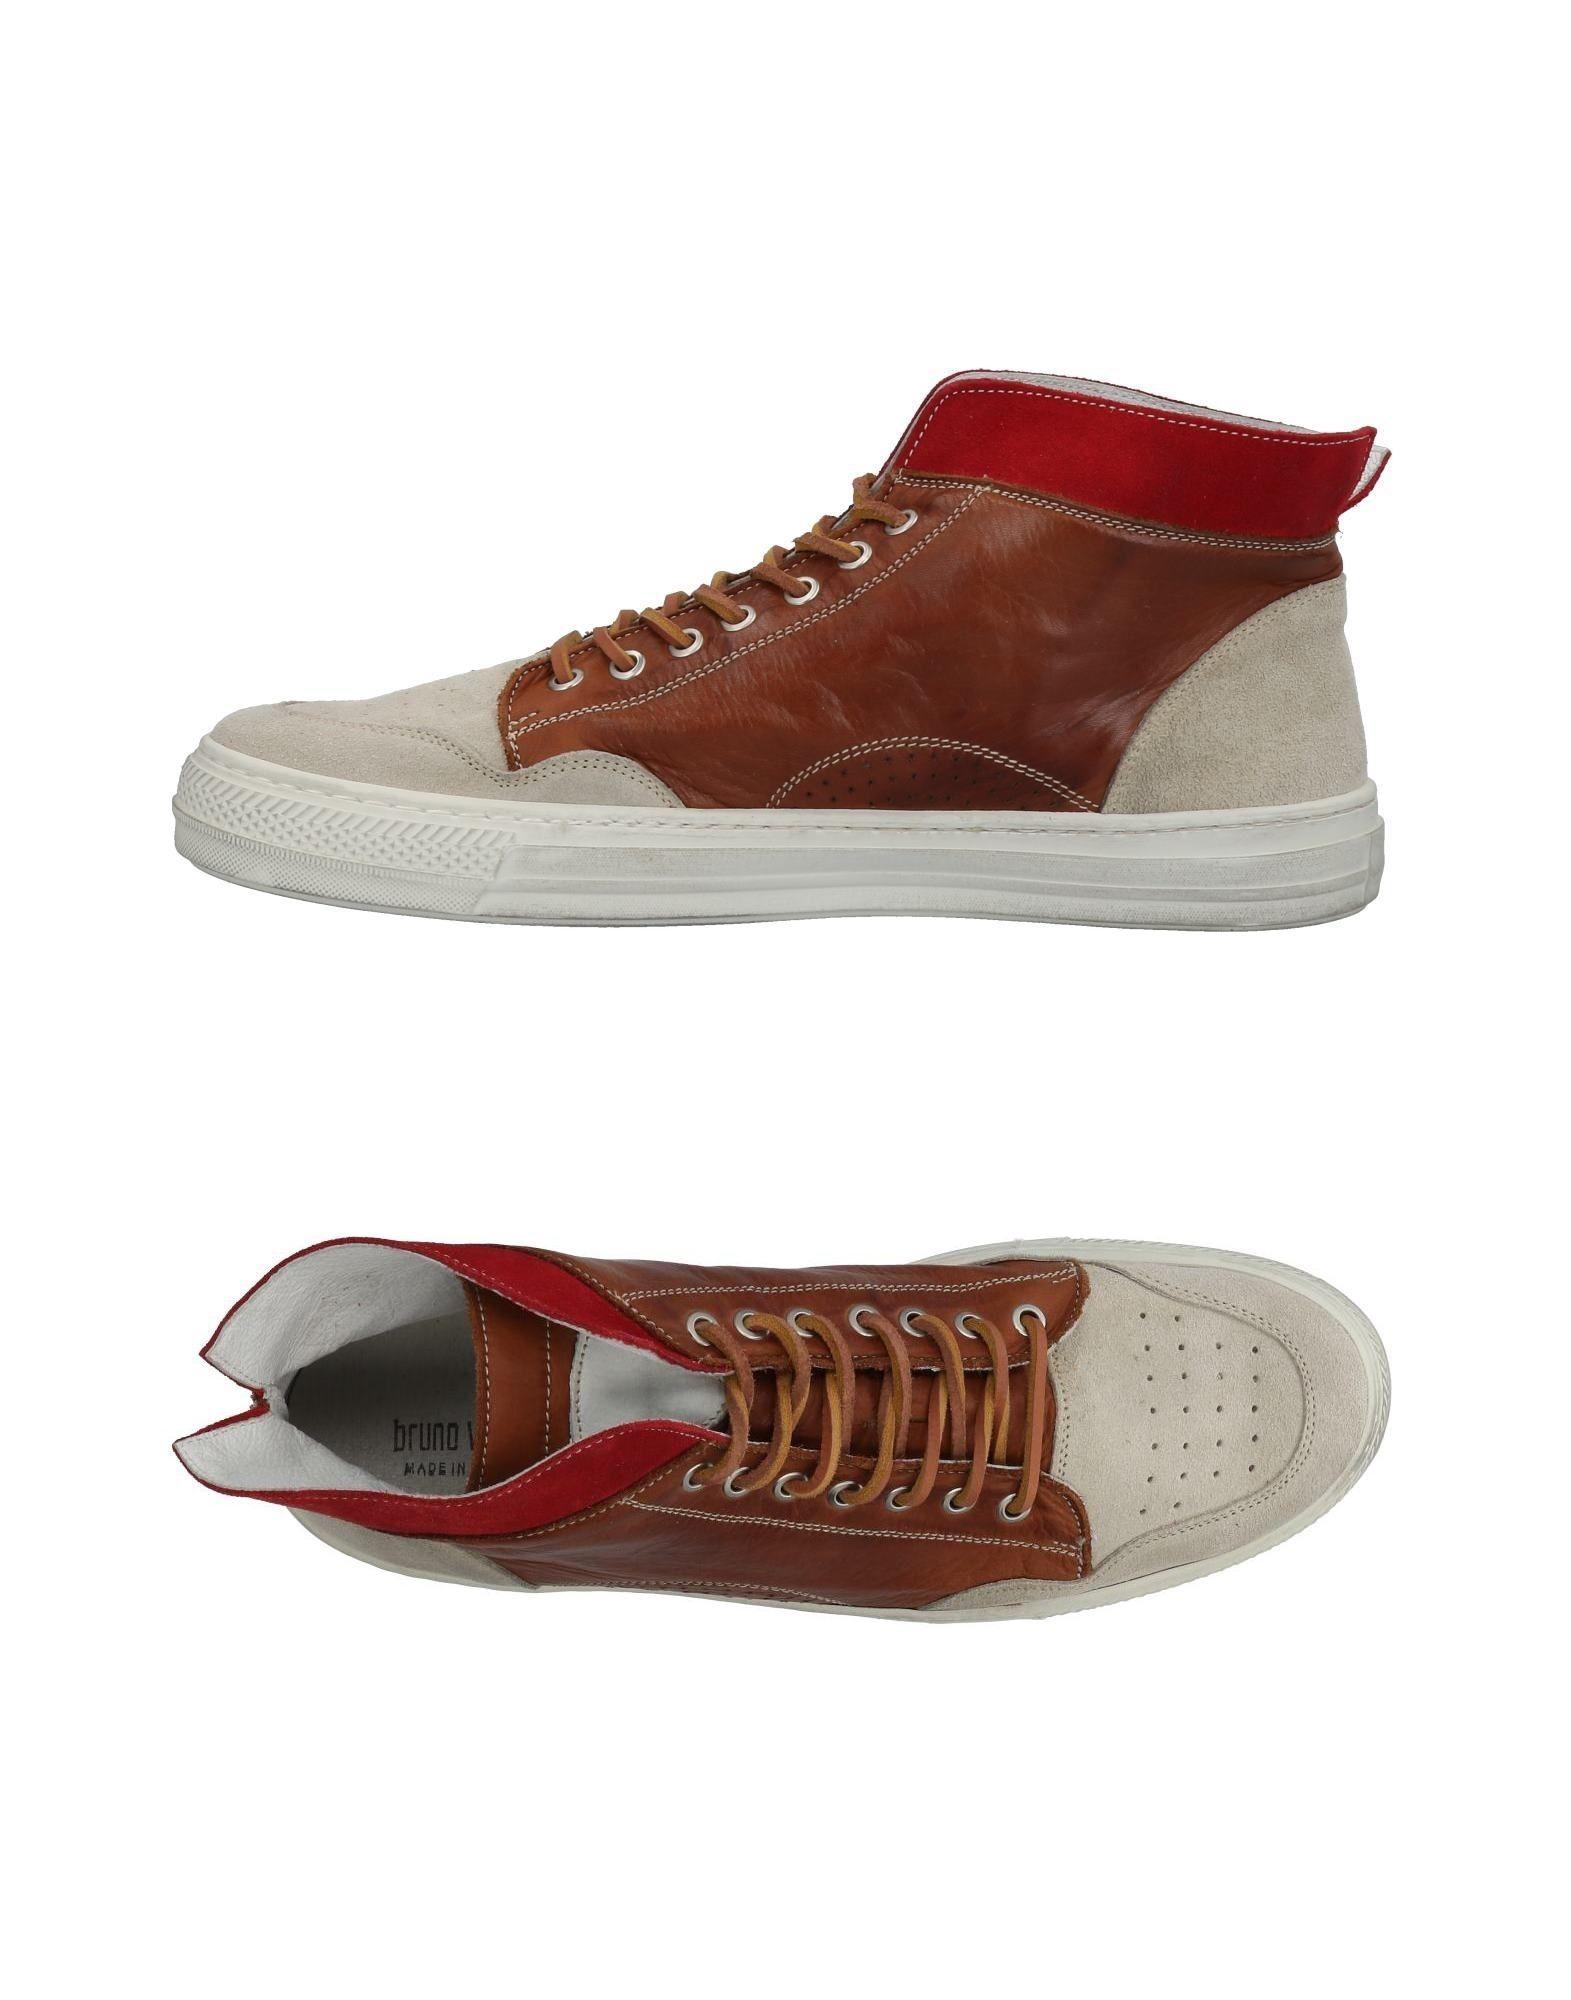 Sneakers Bruno Verri Uomo - Acquista online su